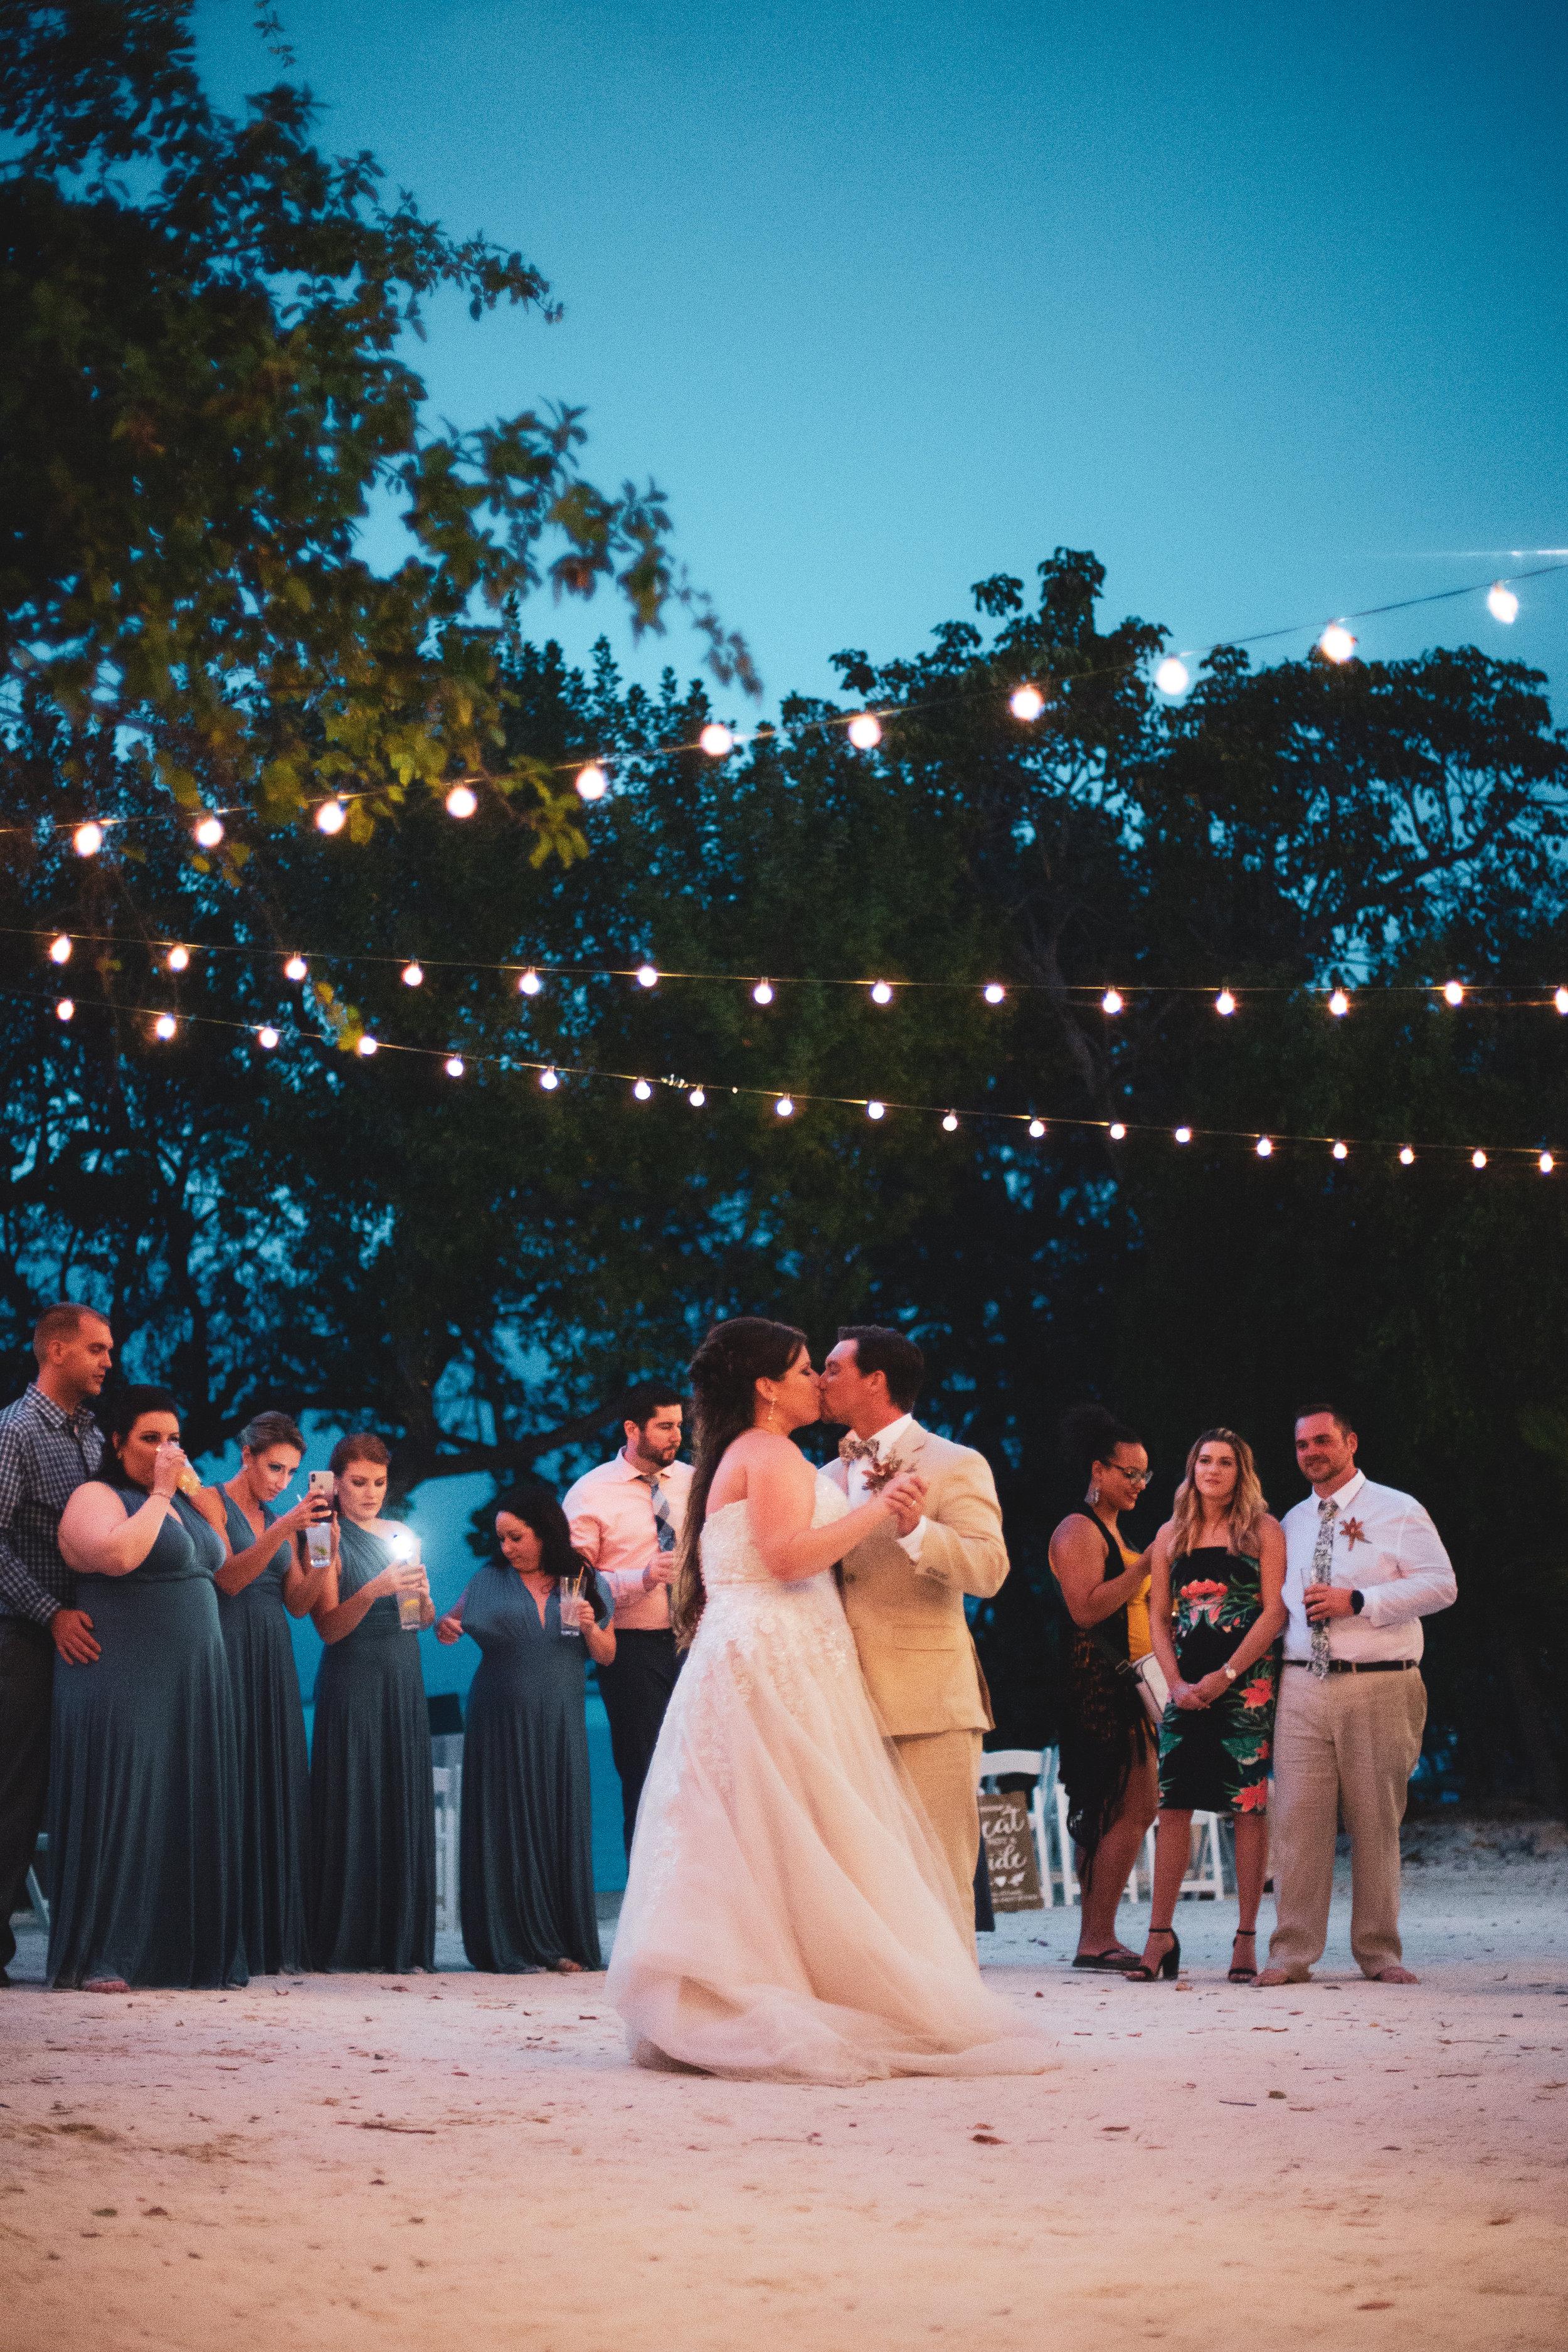 key largo florida beach wedding © kelilina photography 20190316185141-1.jpg